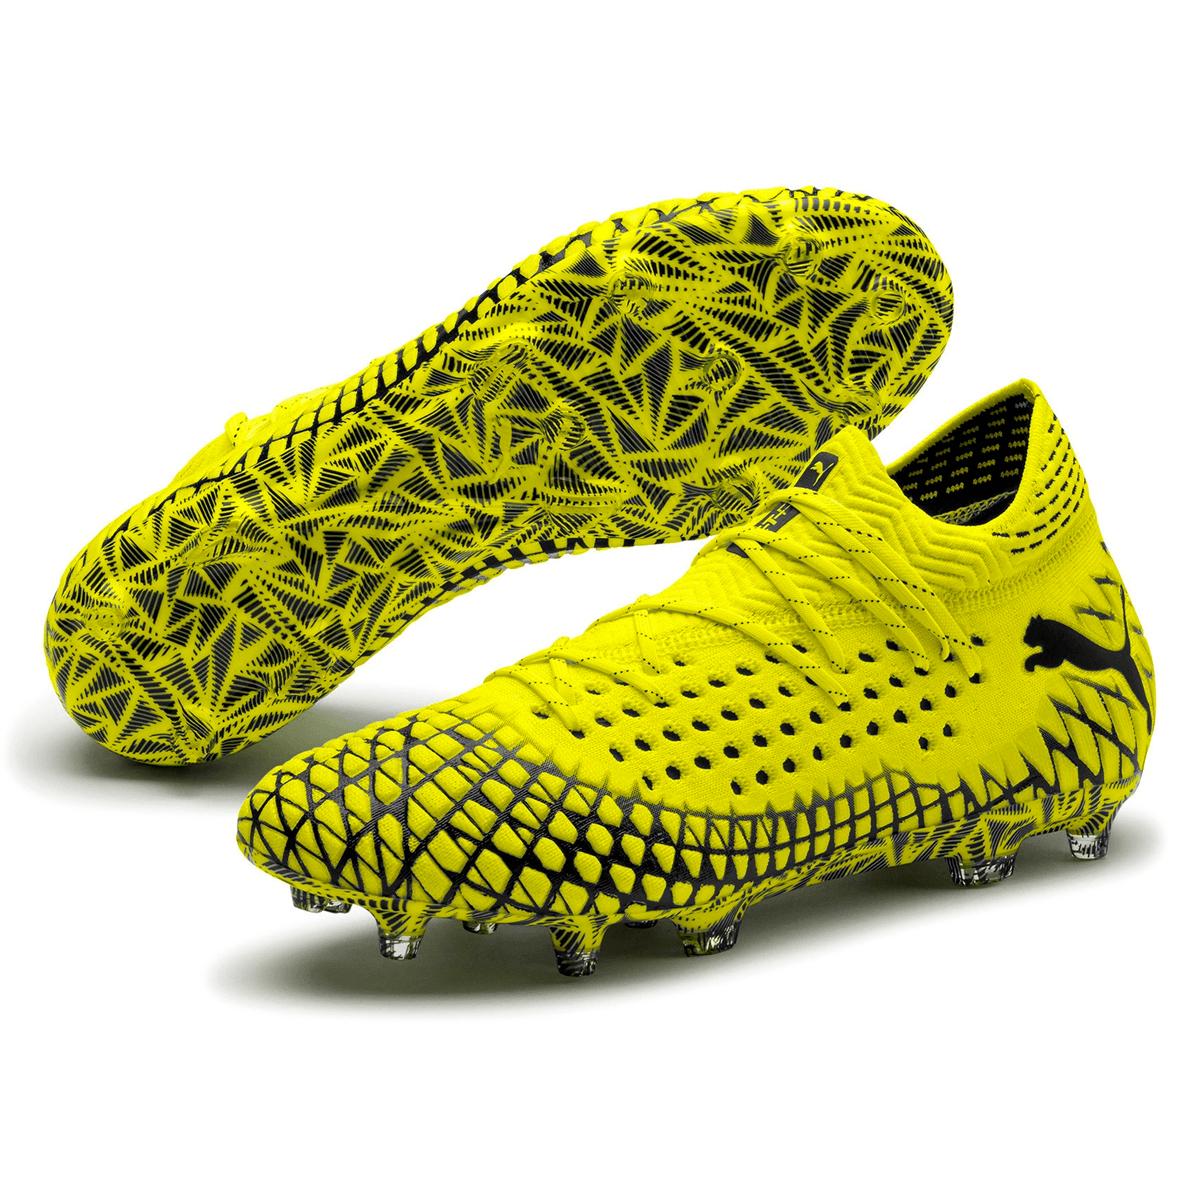 Puma voetbalschoenen Future 4.1 Netfit FG/AG geel fluo/zwart